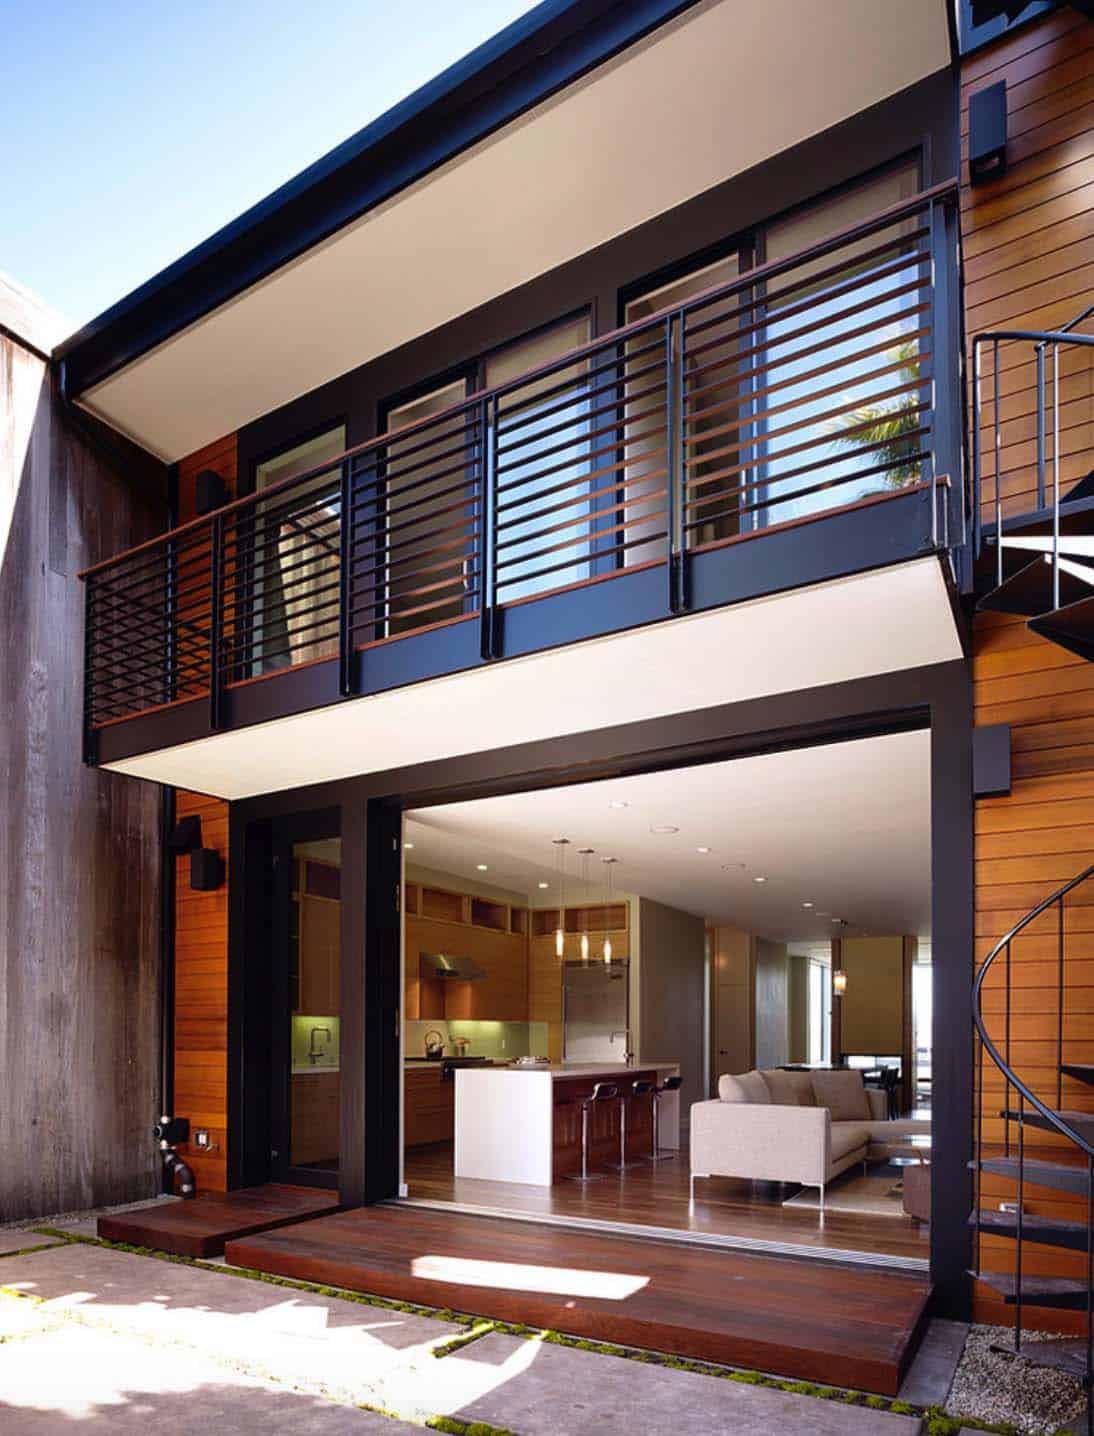 Architecture Modern Hillside Home-22-1 Kindesign